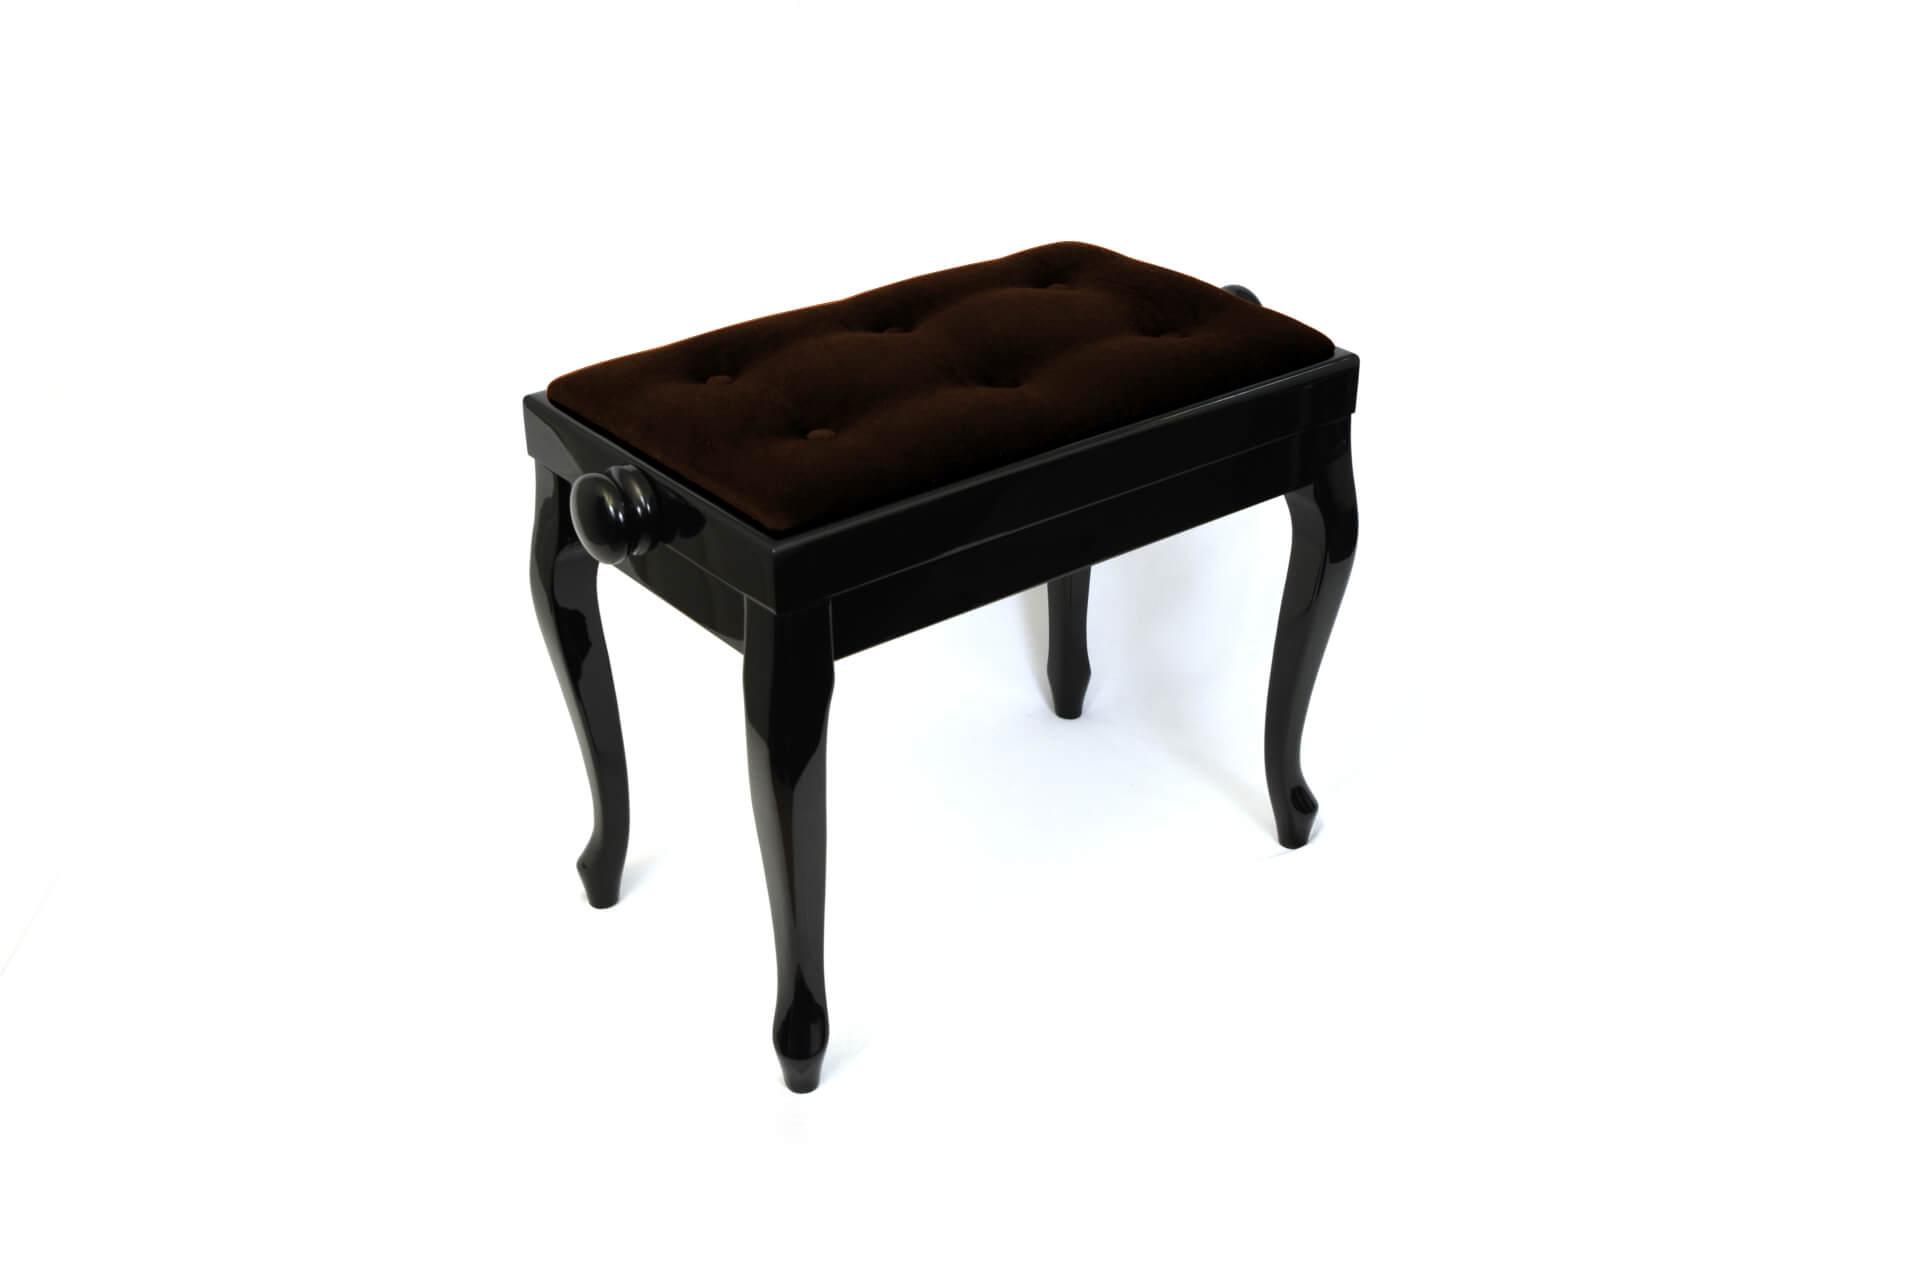 tabouret de piano vivaldi velours marron. Black Bedroom Furniture Sets. Home Design Ideas